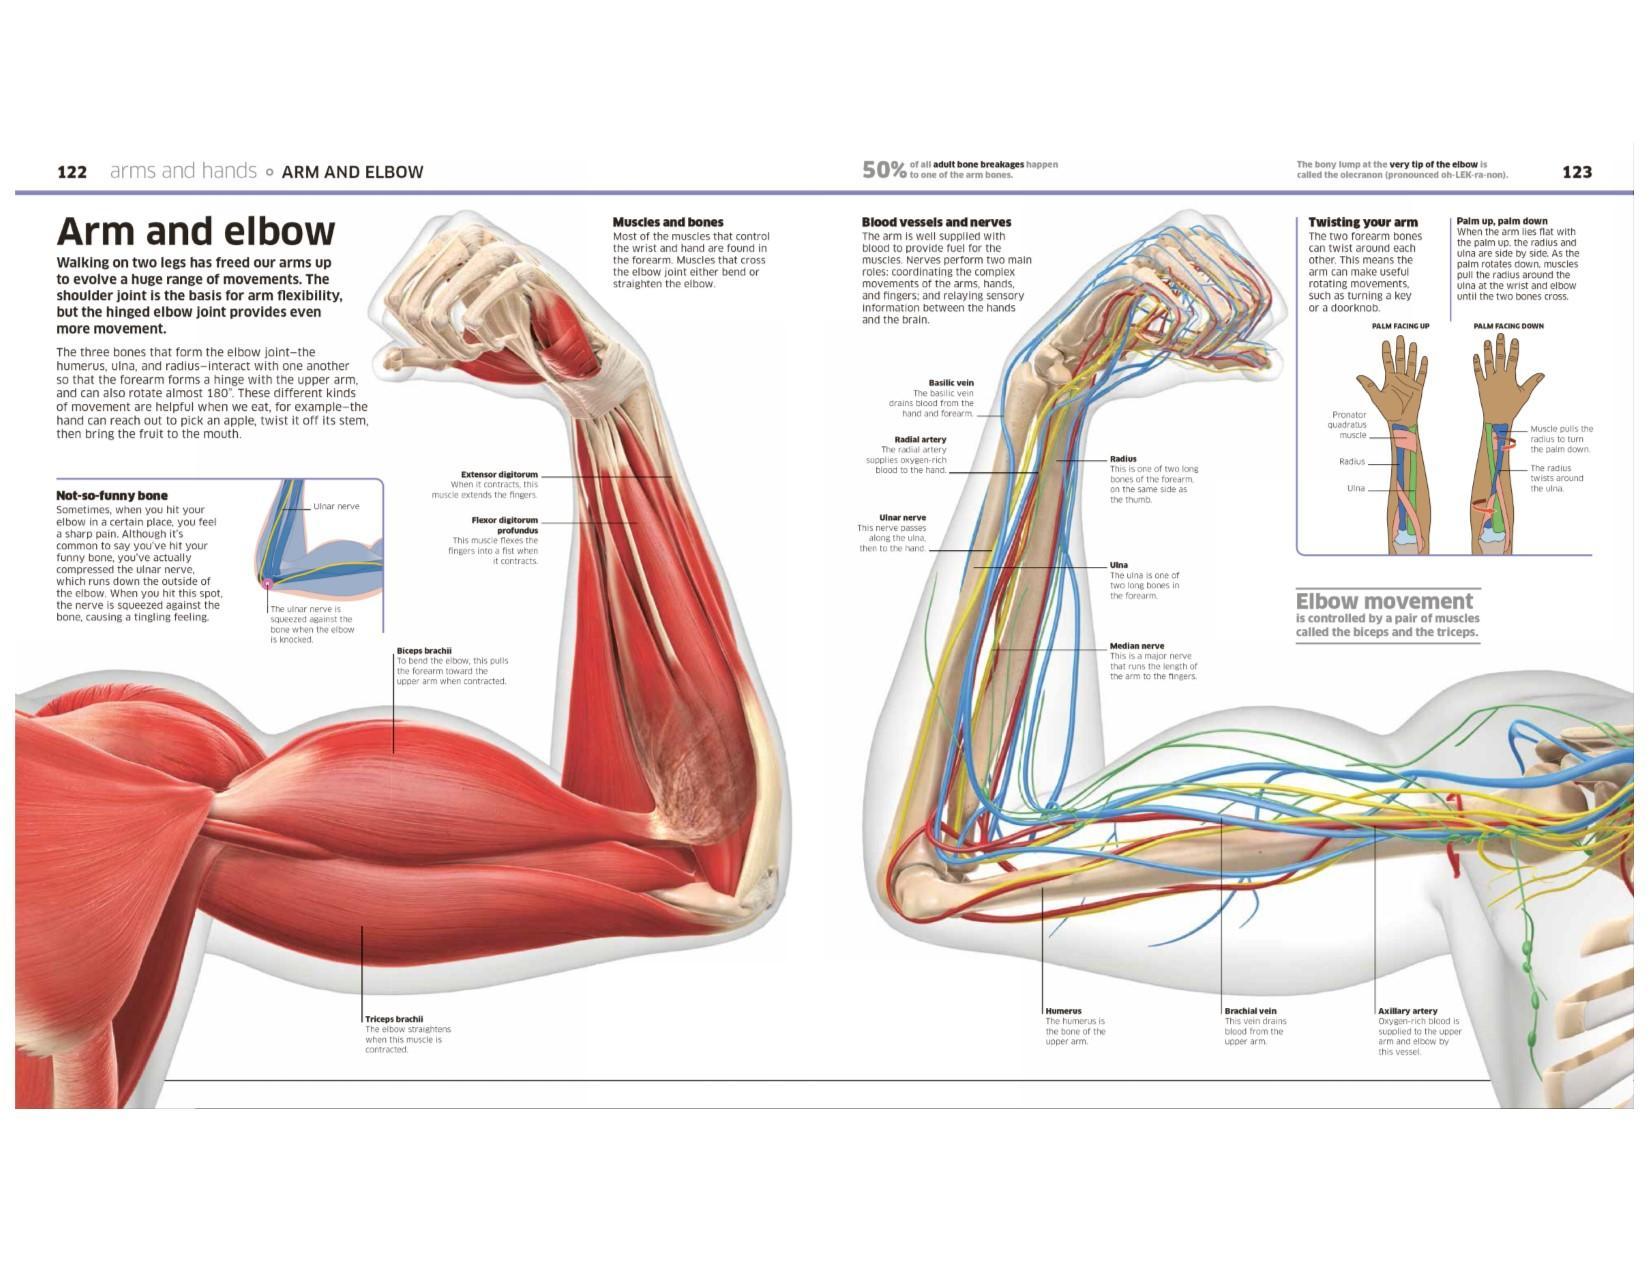 Großzügig Hirnlappen Anatomie Bilder - Anatomie Ideen - finotti.info